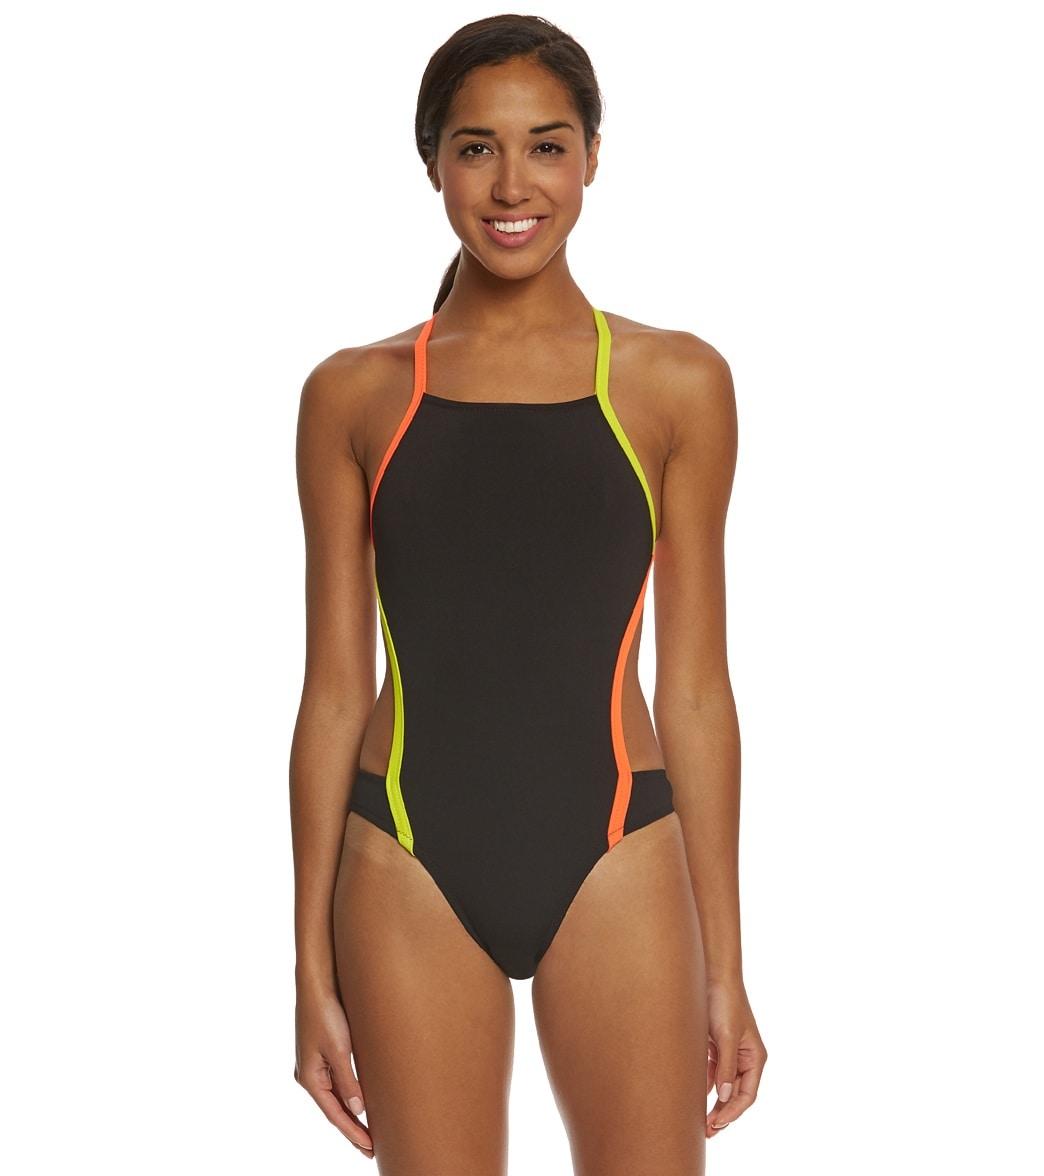 shepretty Girl Mermaid Tail Swimsuit Bikini Four-Piece Suit